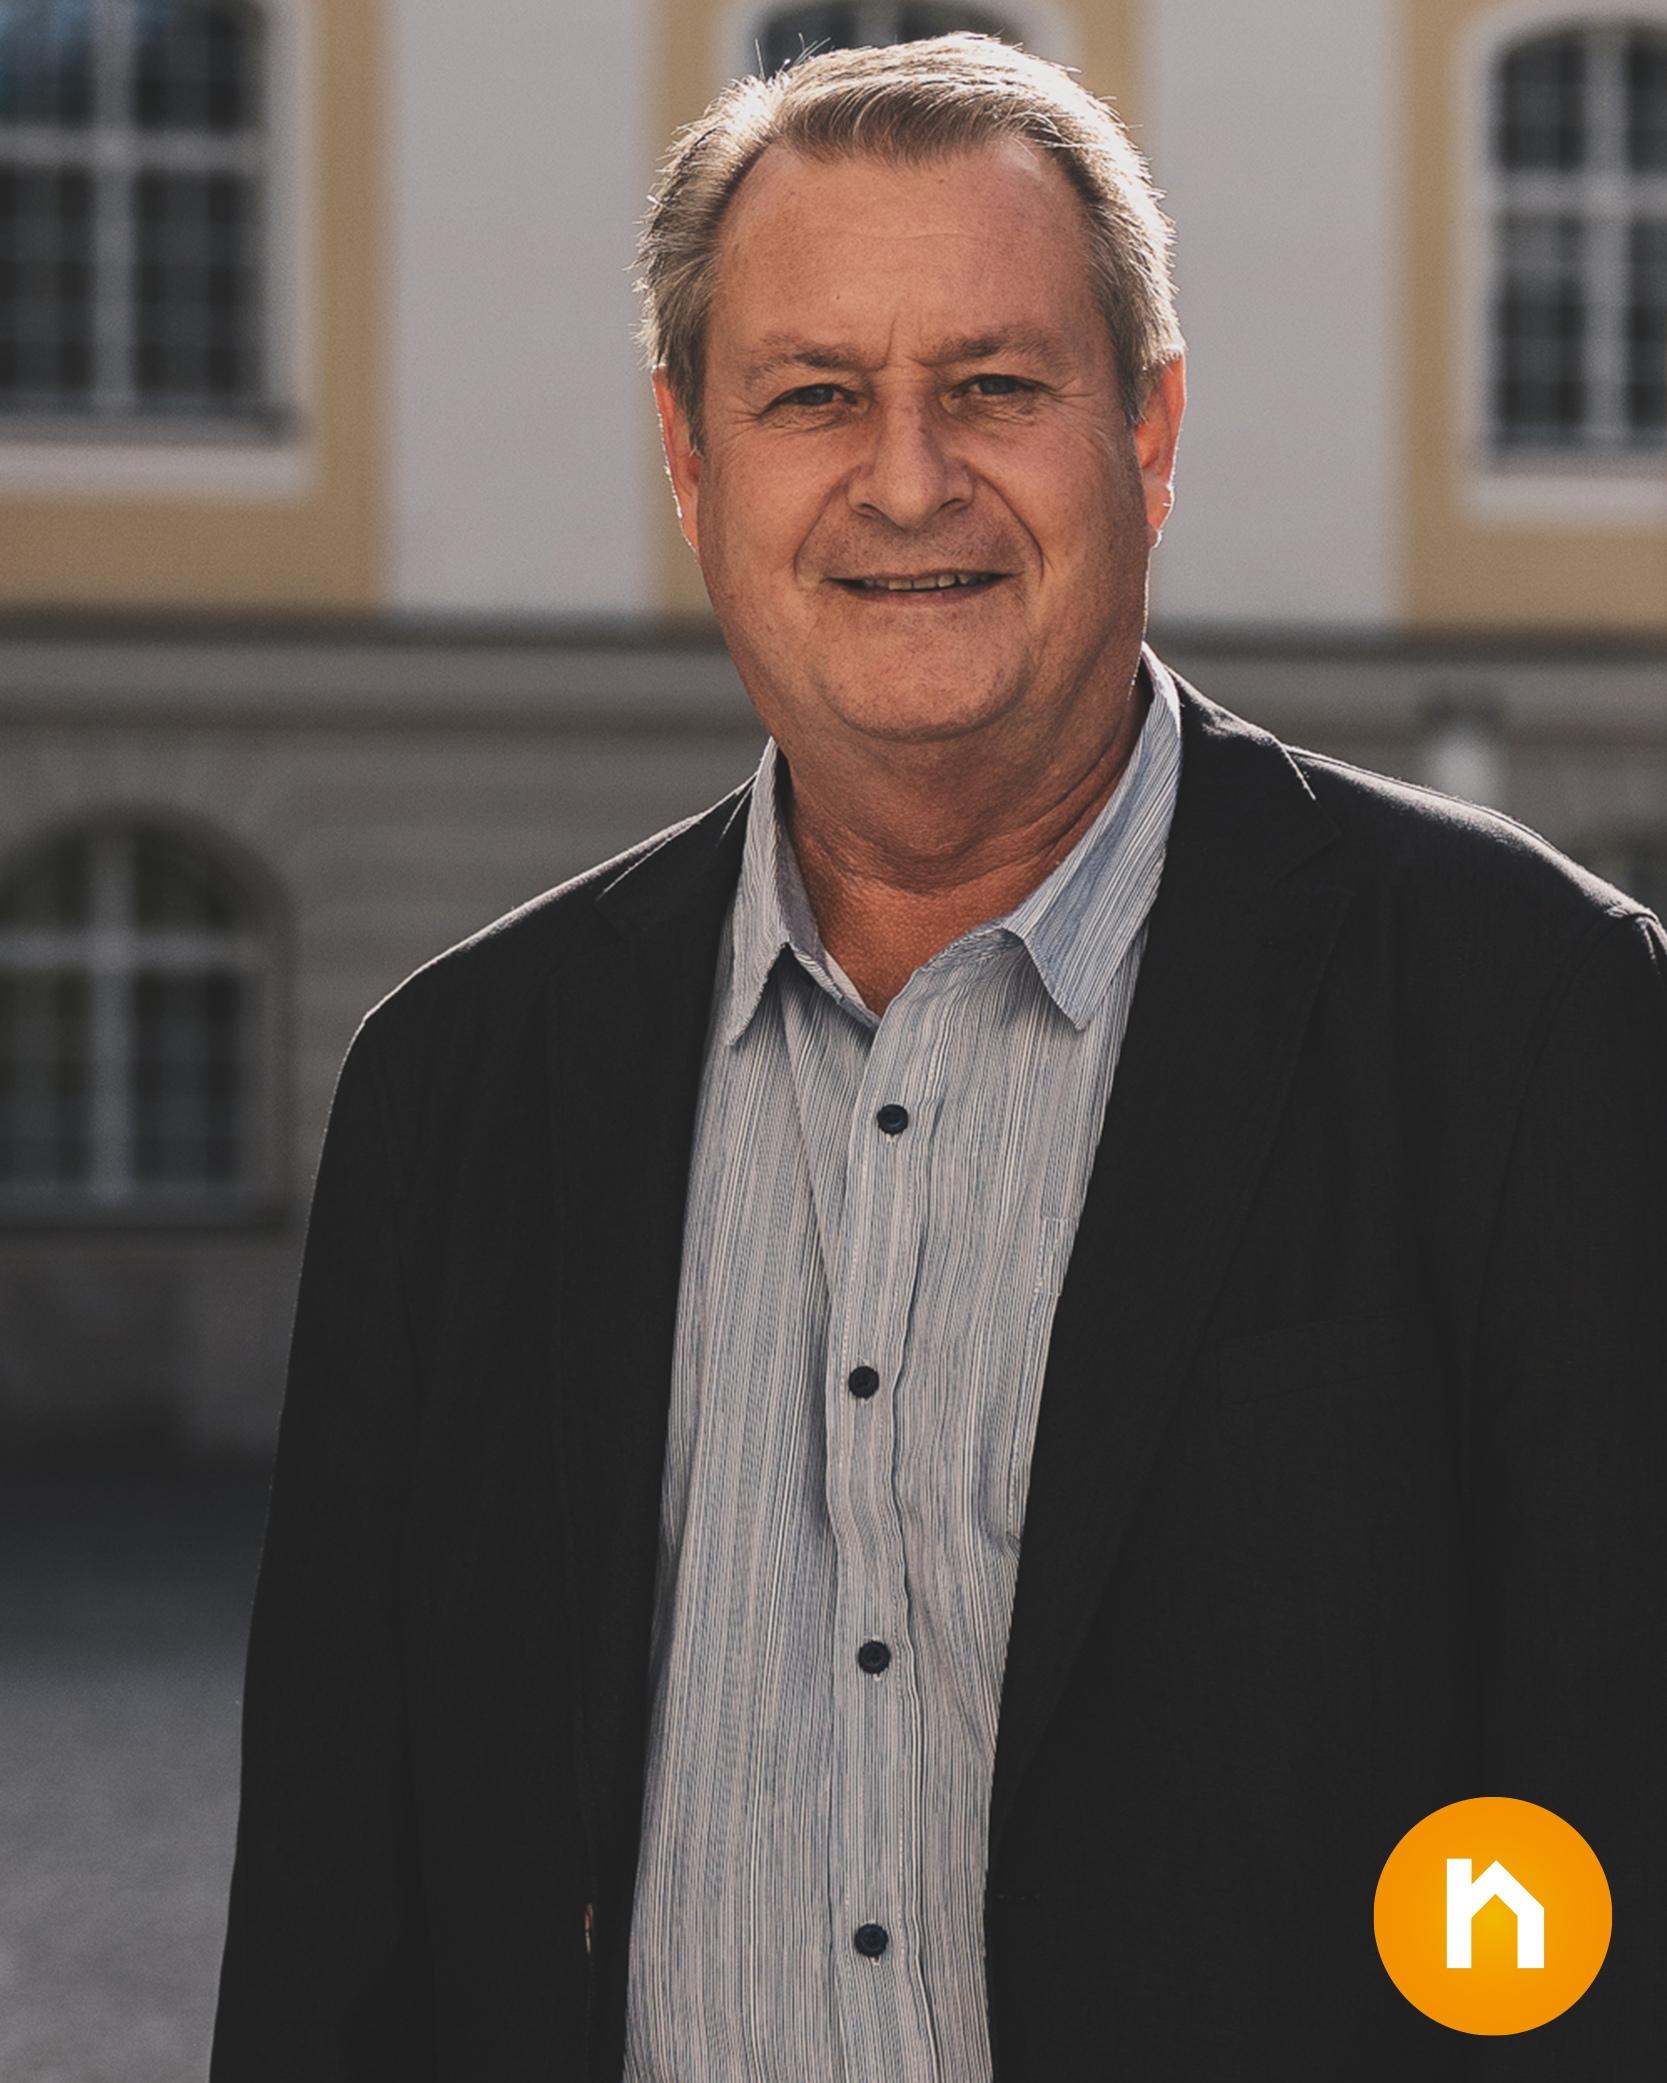 Verrentungsexperte Peter Kotschate